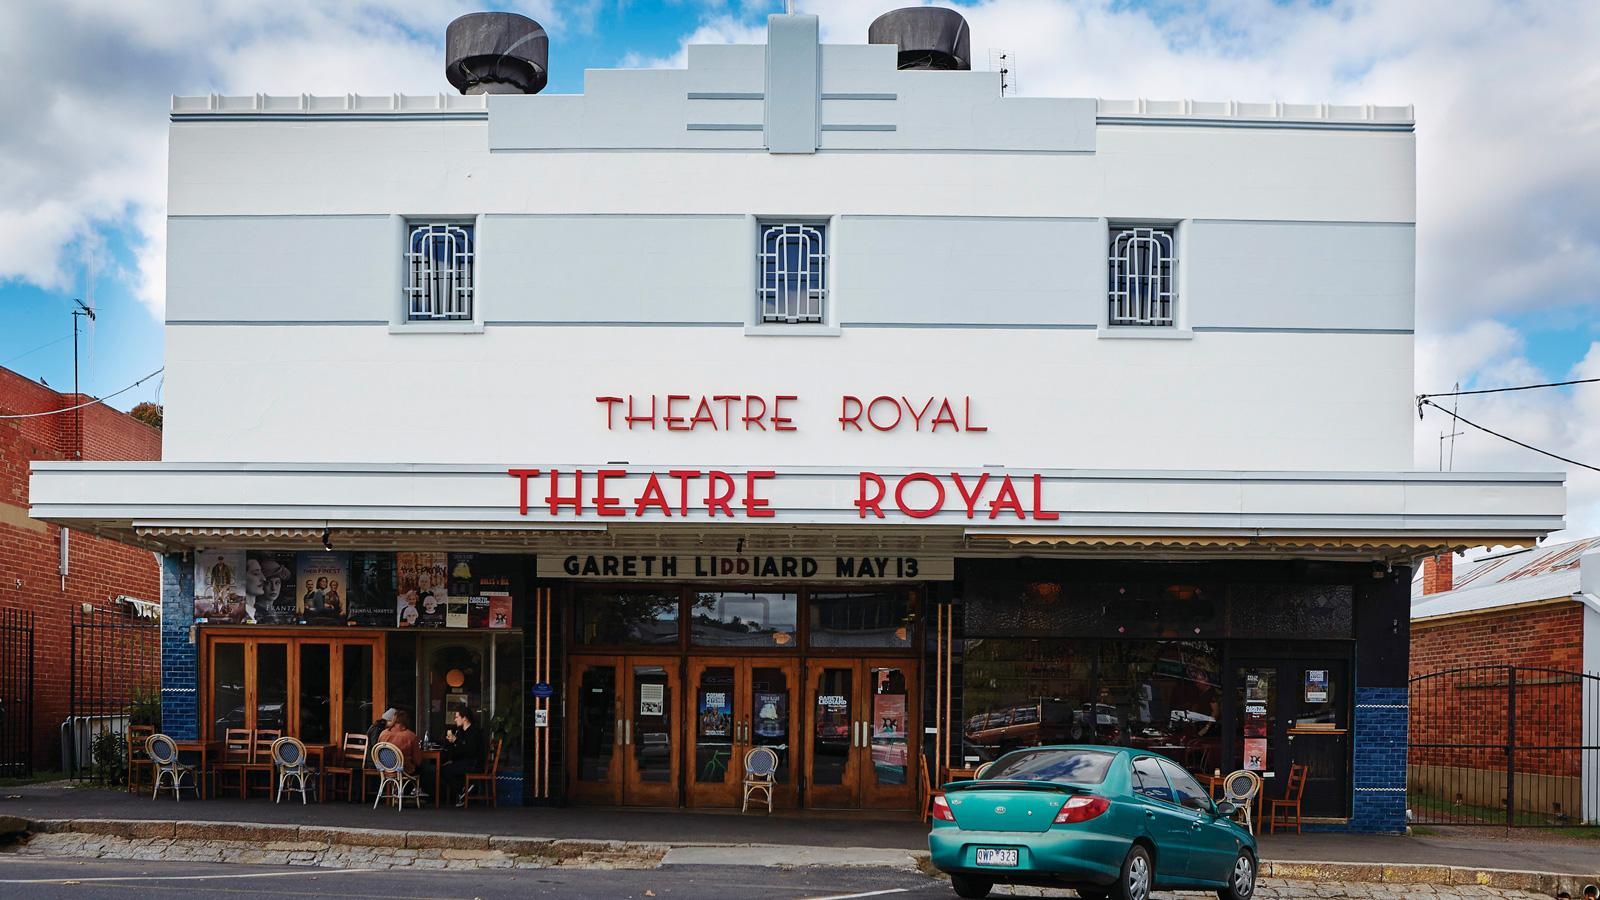 Theatre Royal, Castlemaine, Goldfields, Victoria, Australia